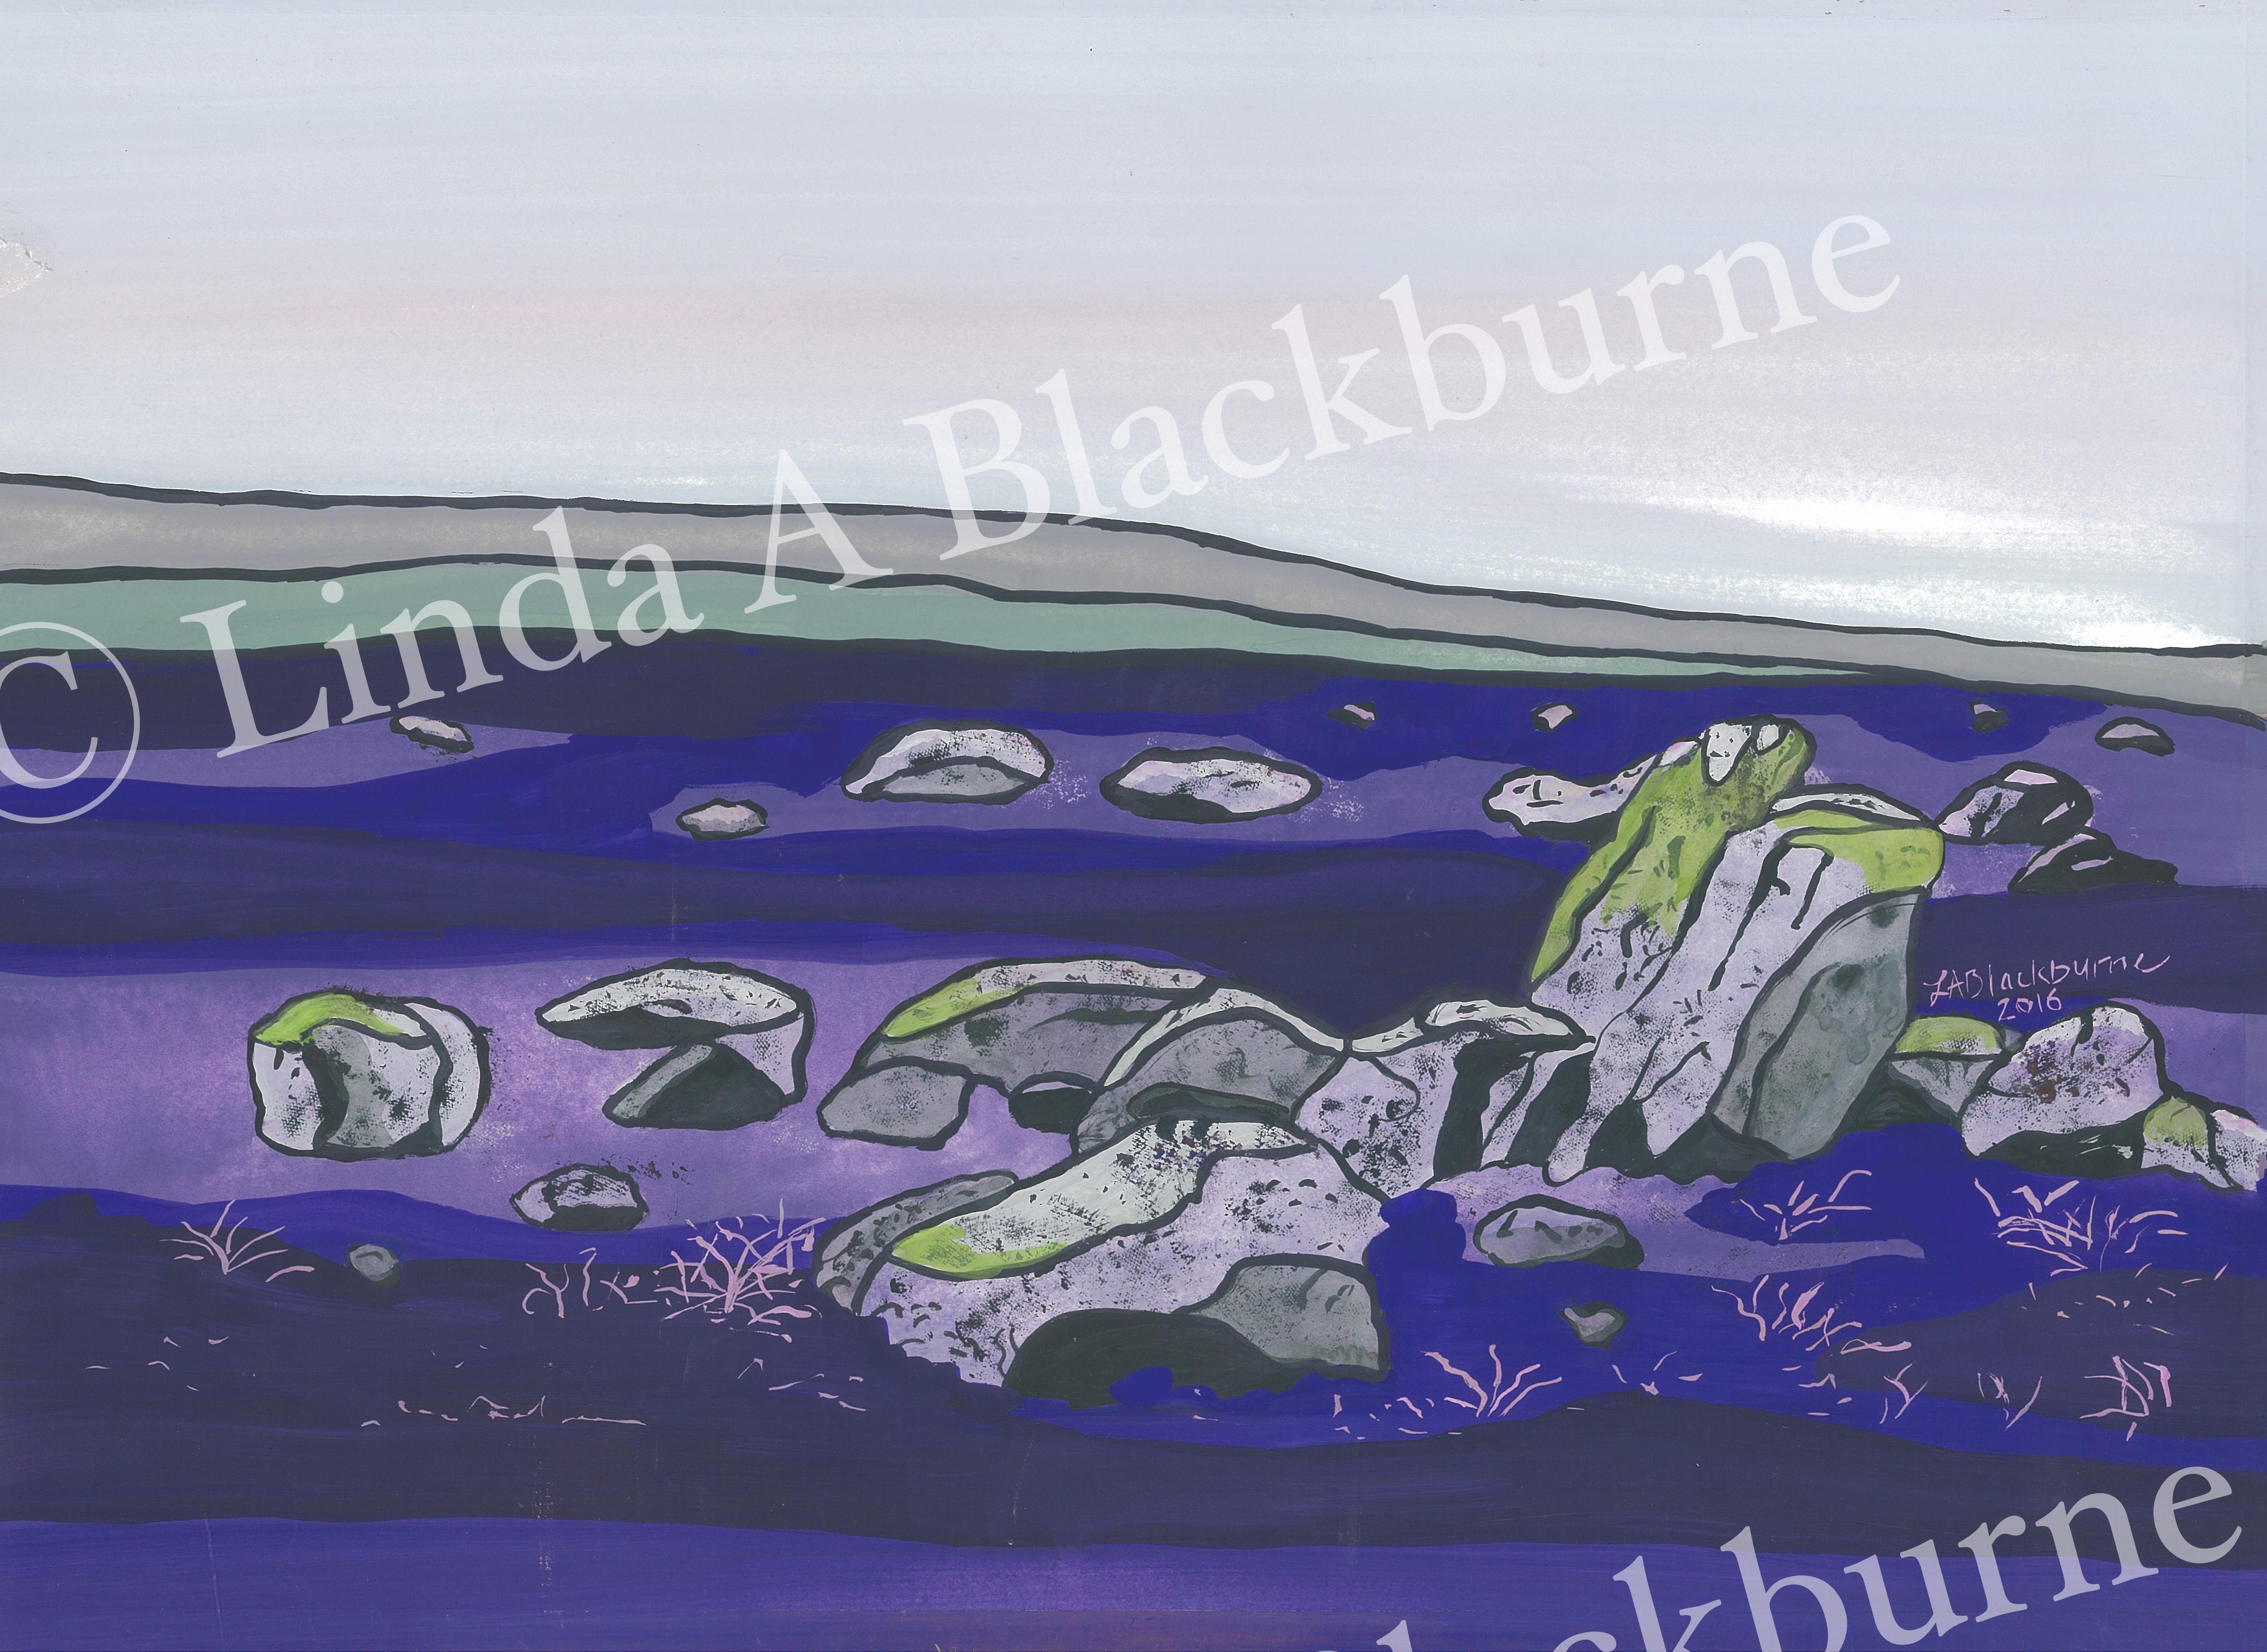 Boulders on Spaunton Moor